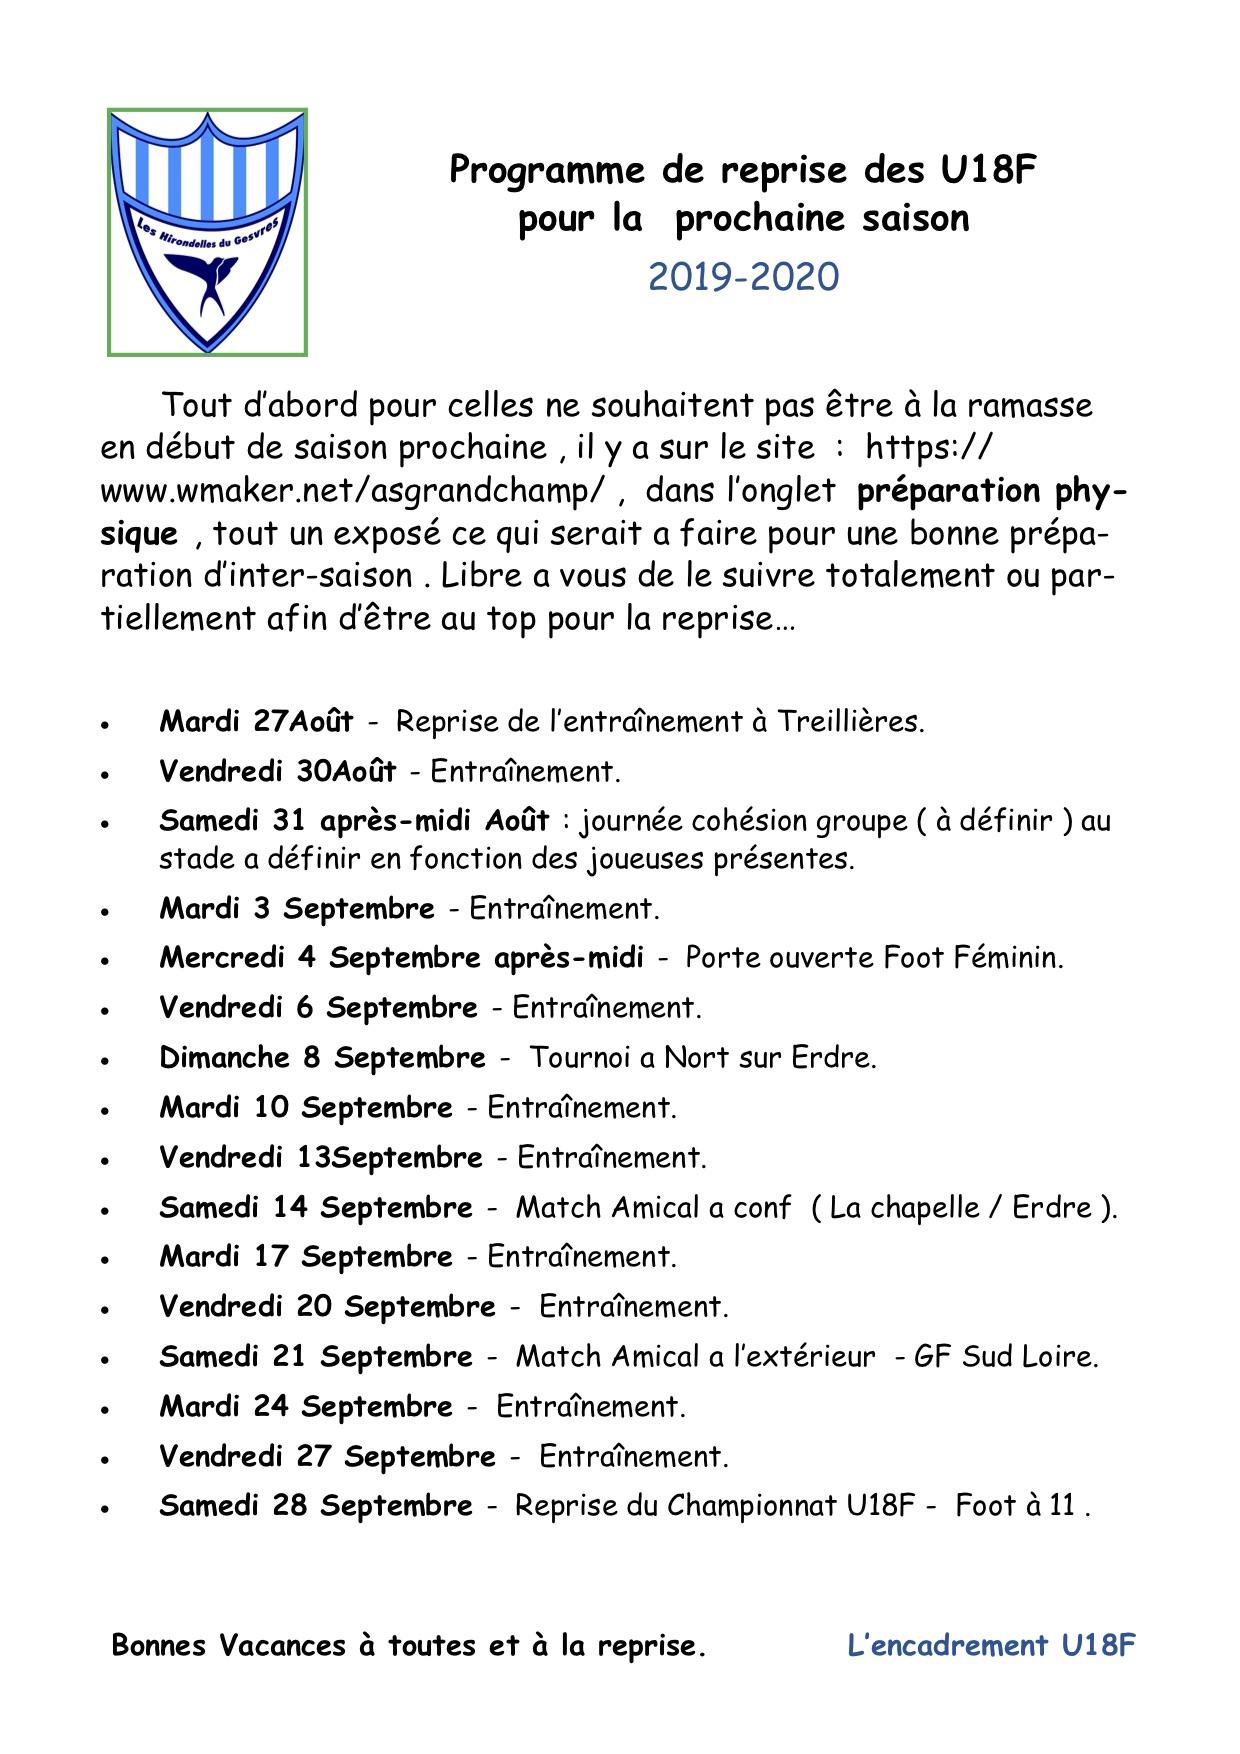 Programme de reprise U18F